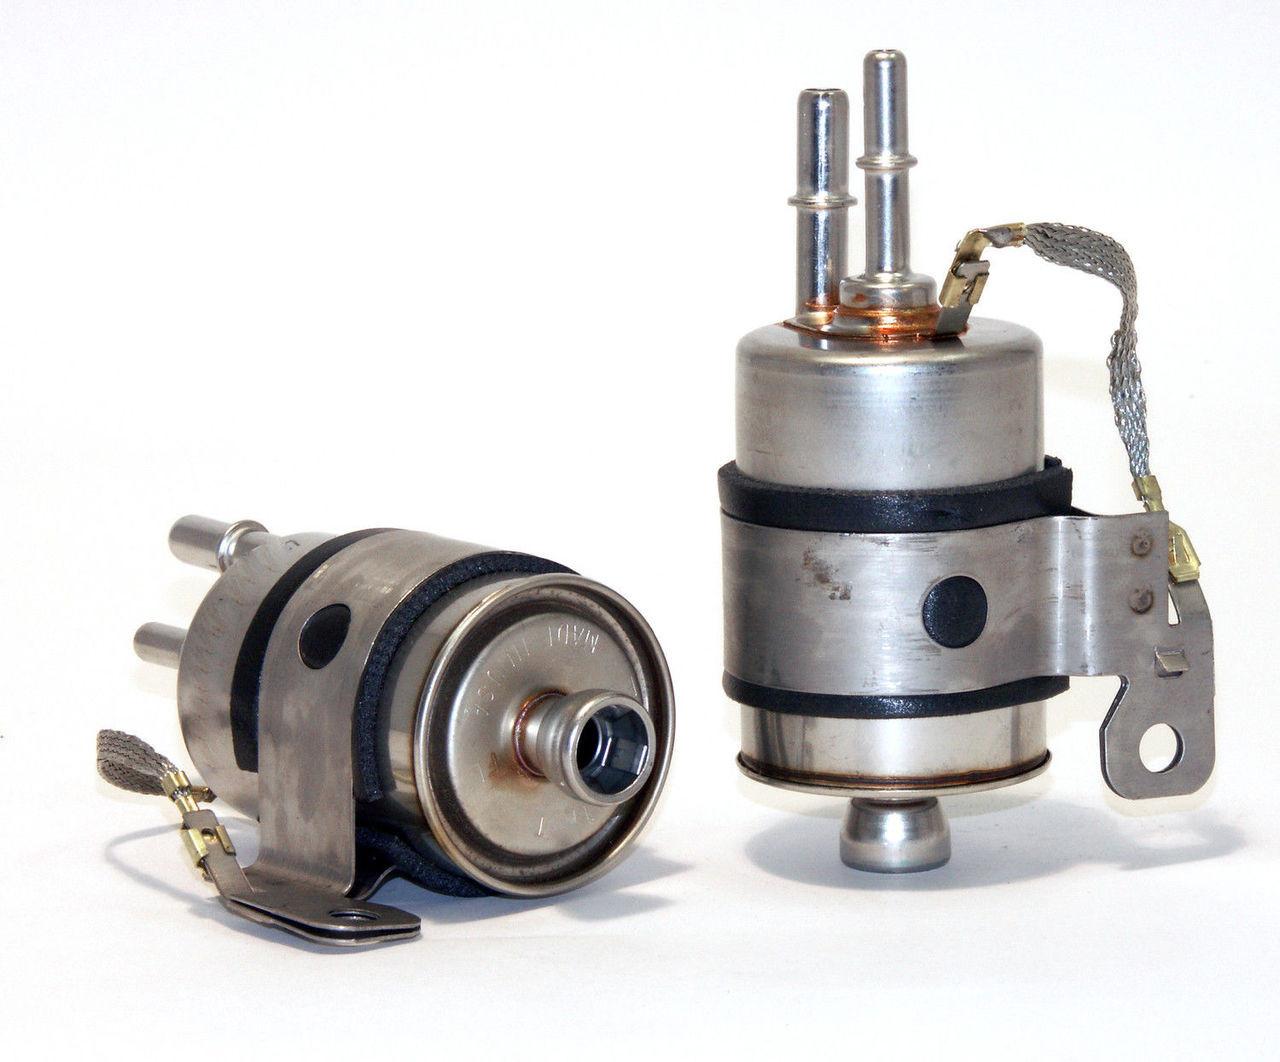 medium resolution of ls1 lsx engine swap wix fuel filter w built in regulator hawksls1 fuel filter 5